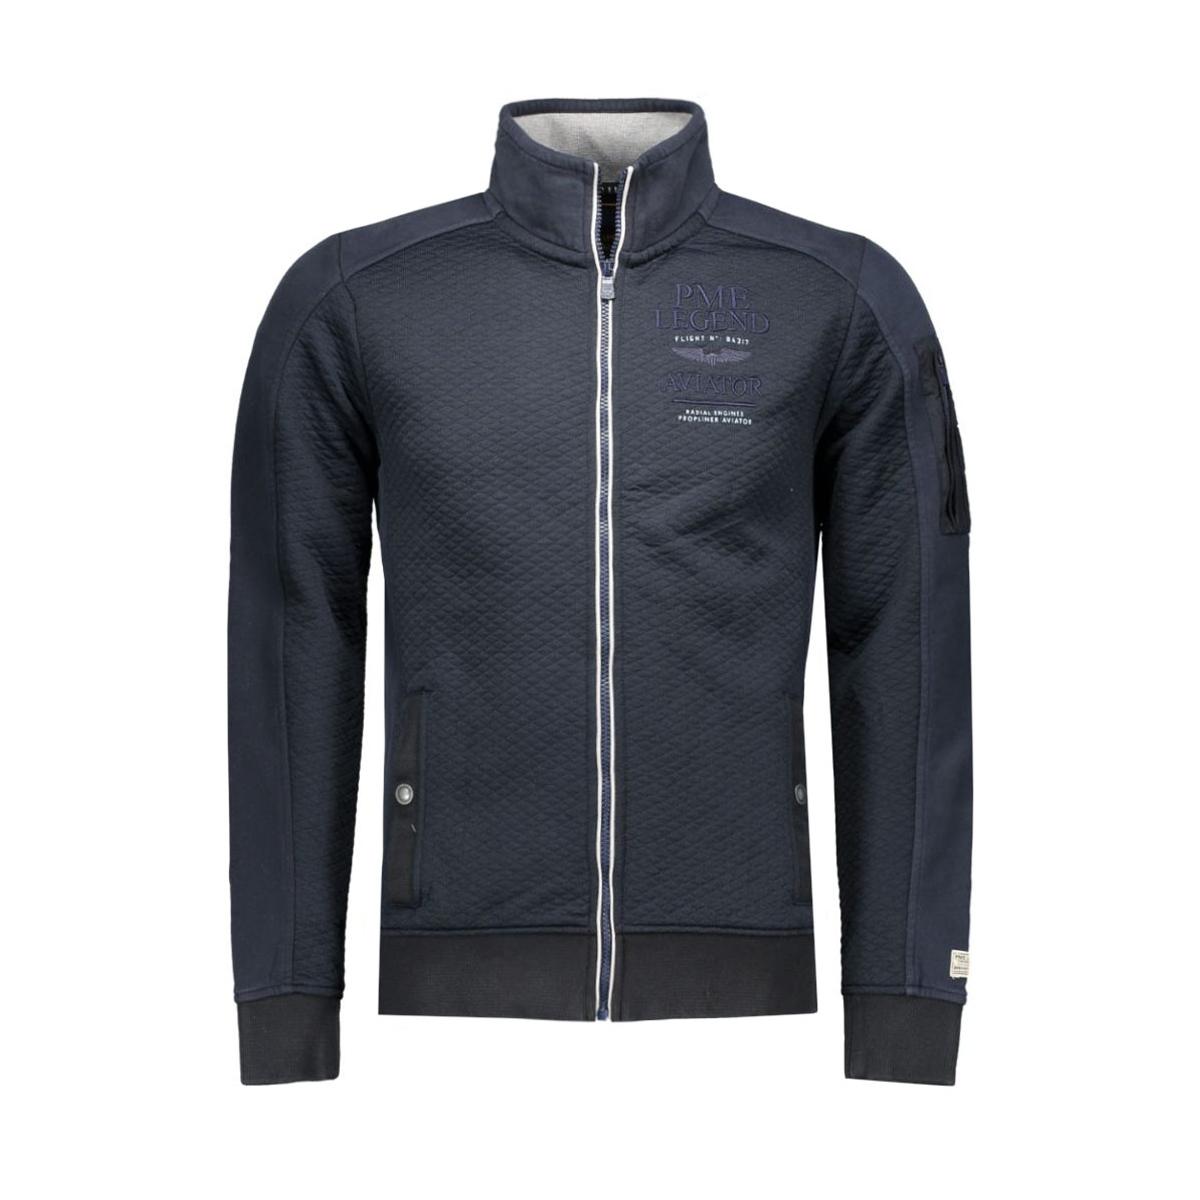 psw65404 pme legend vest 5550